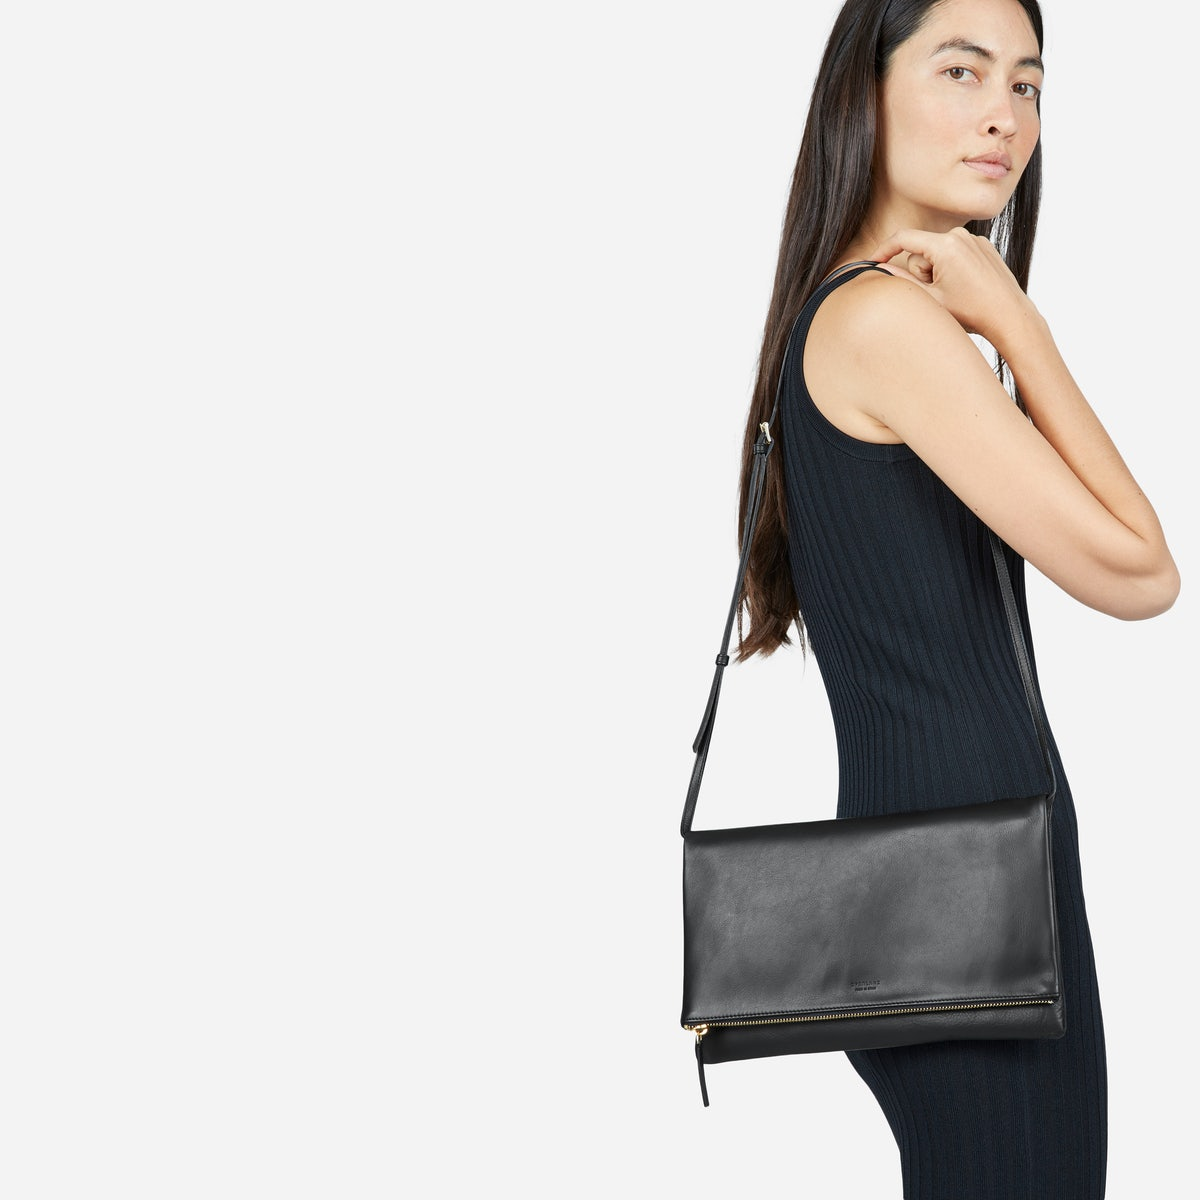 A black purse